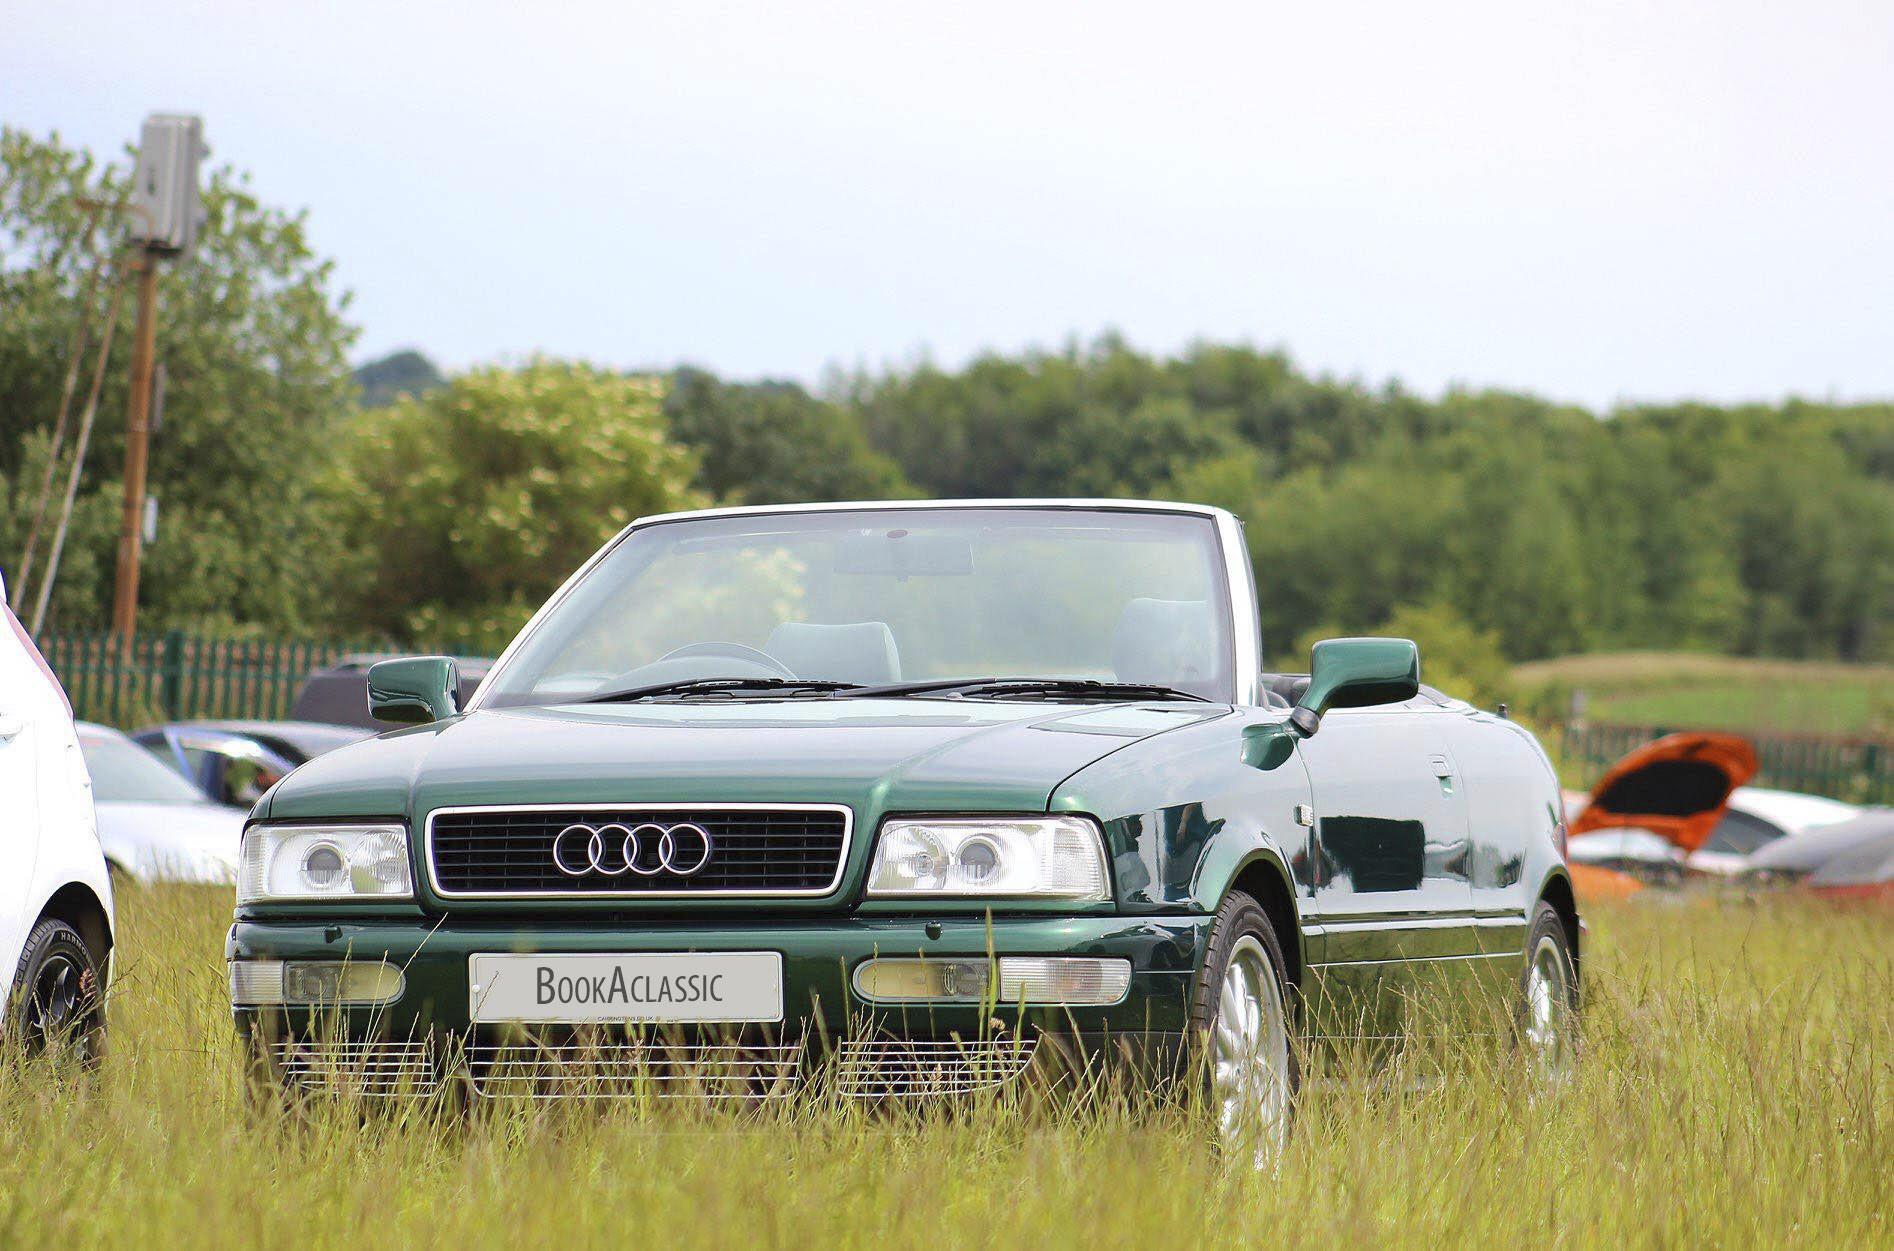 Audi Cabriolet Hire Huddersfield